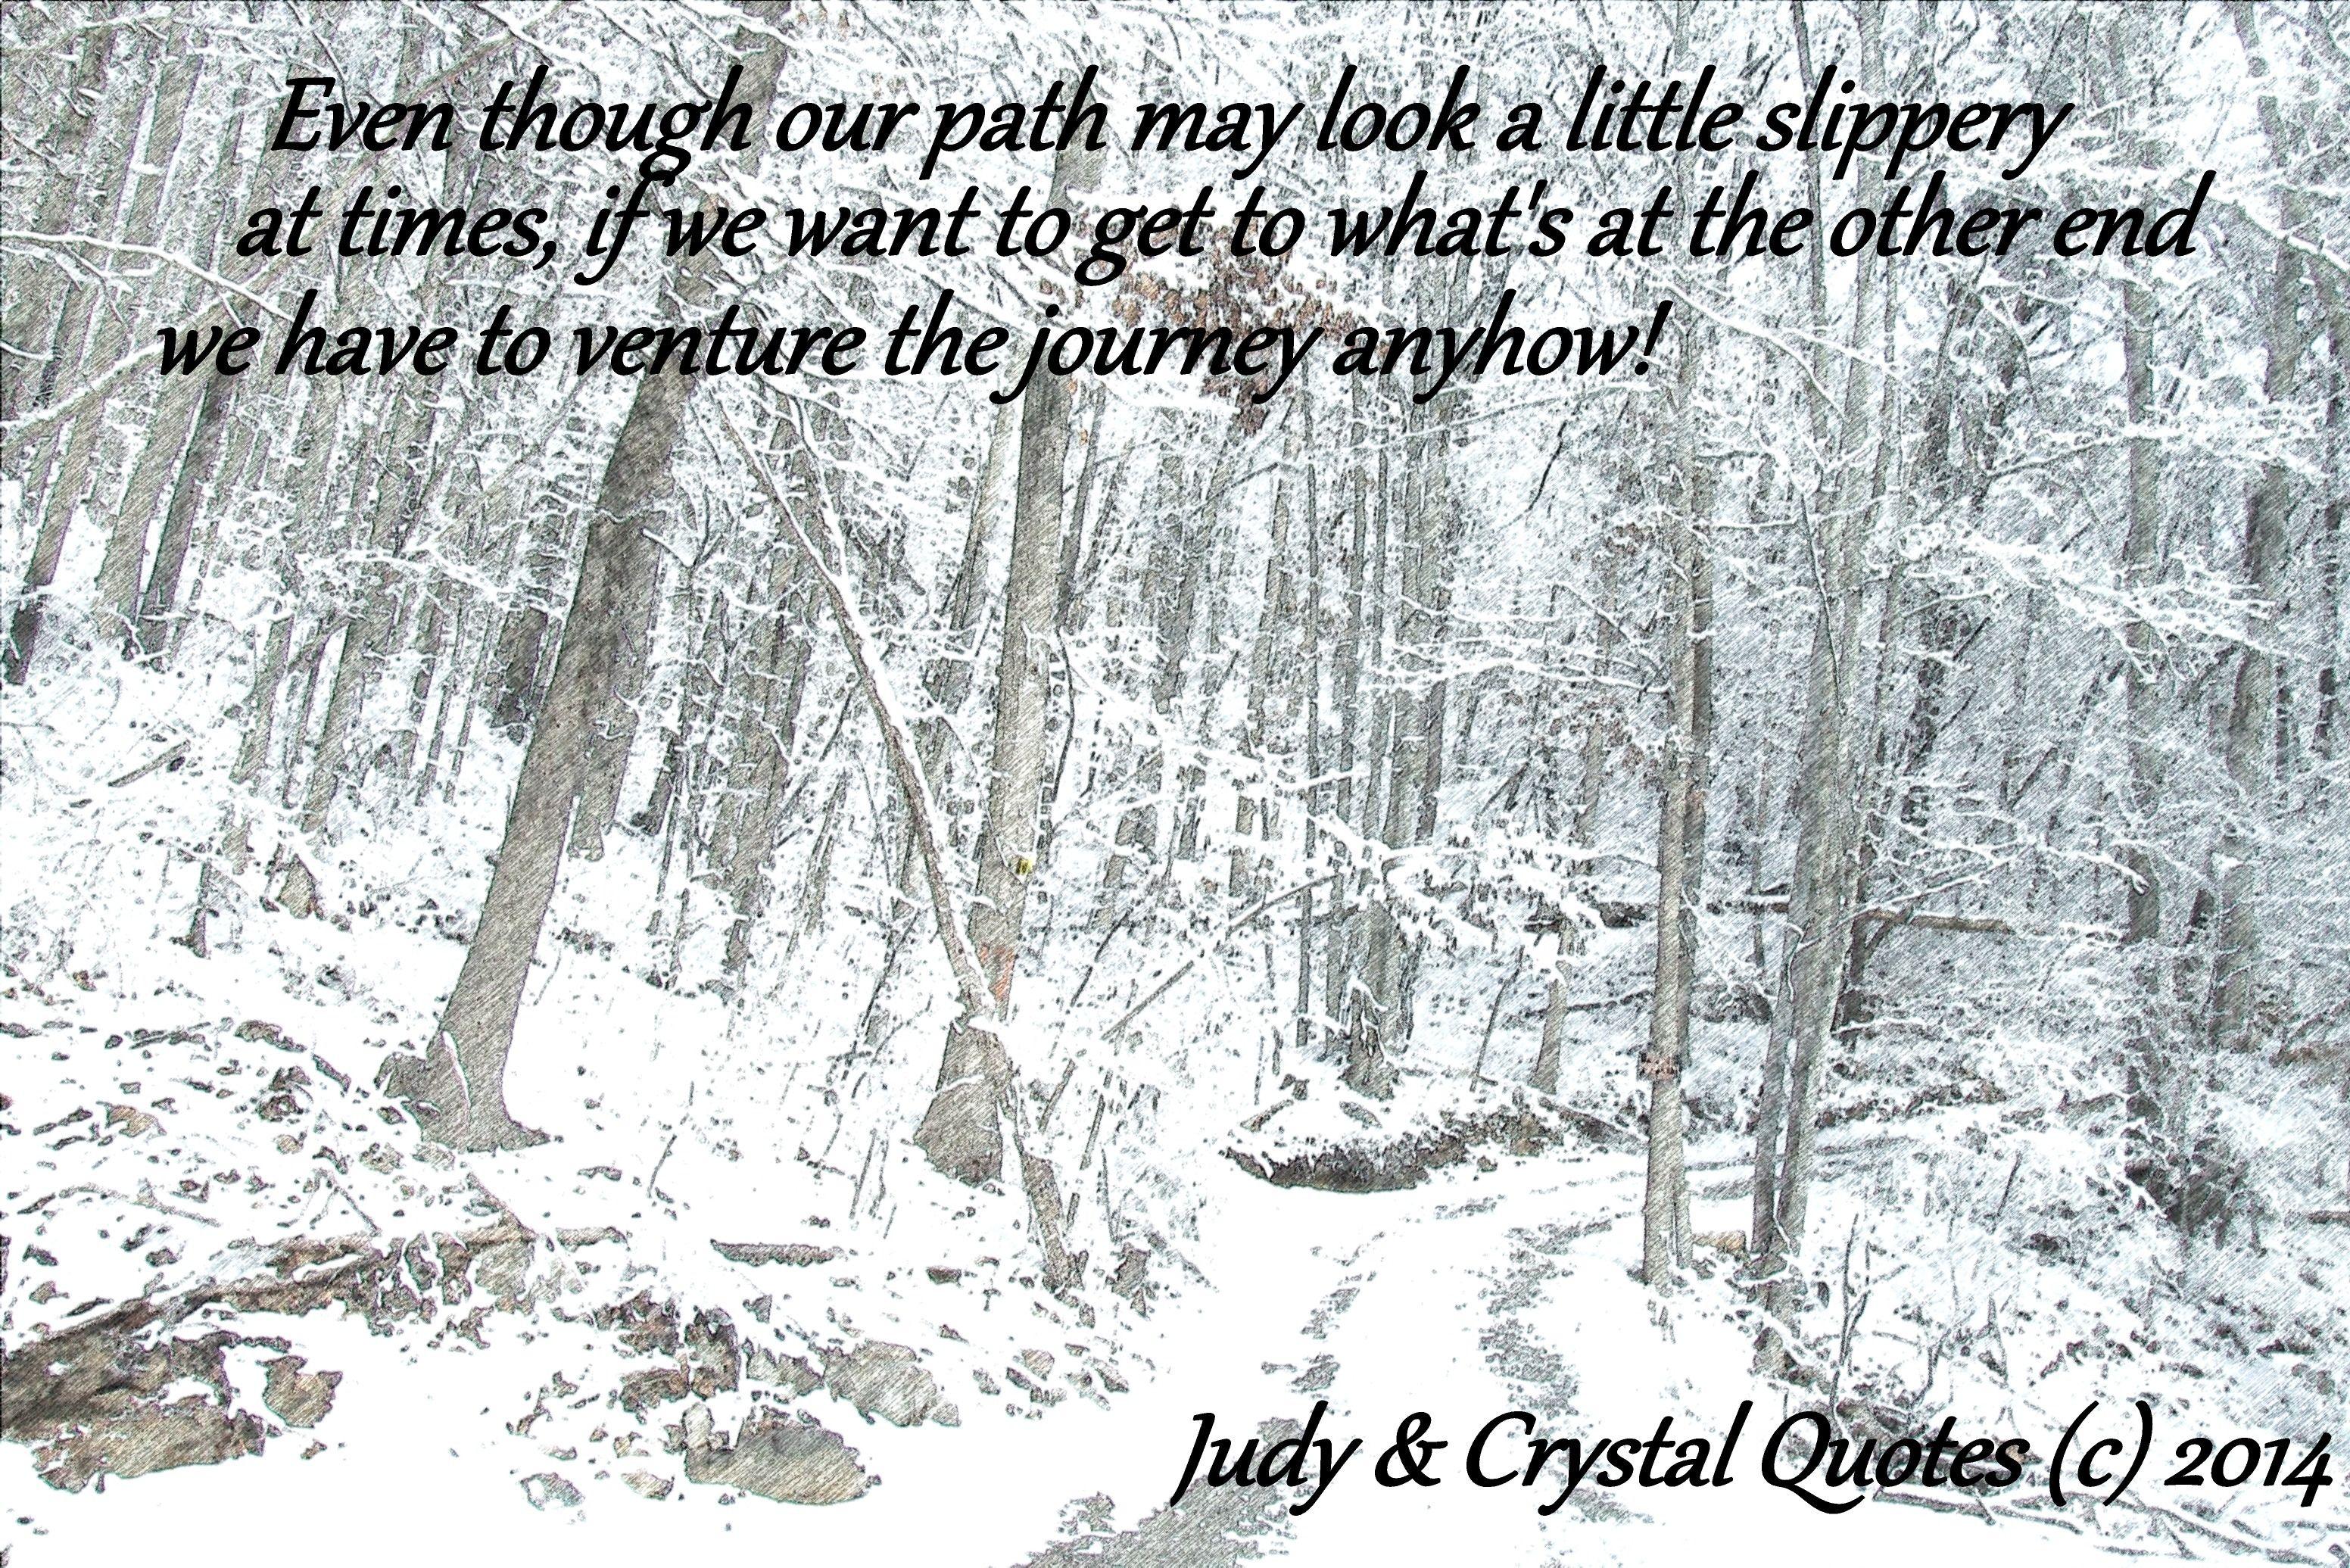 life's paths